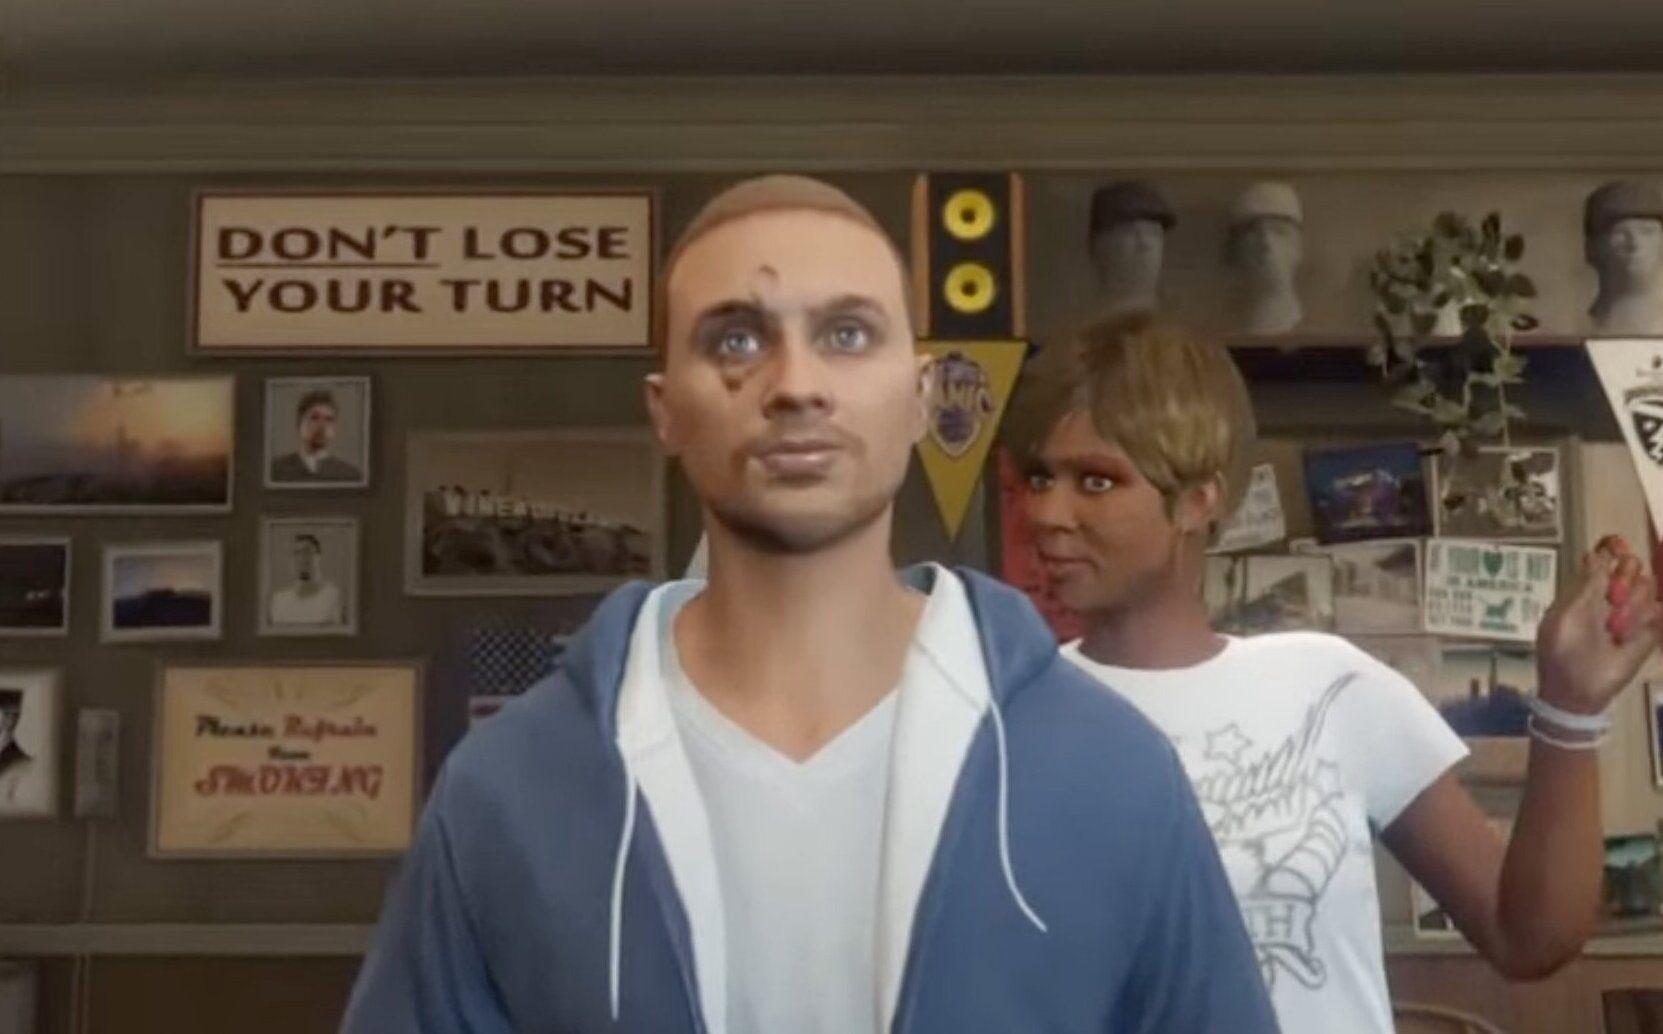 How do you make your GTA character look like Paul Walker?